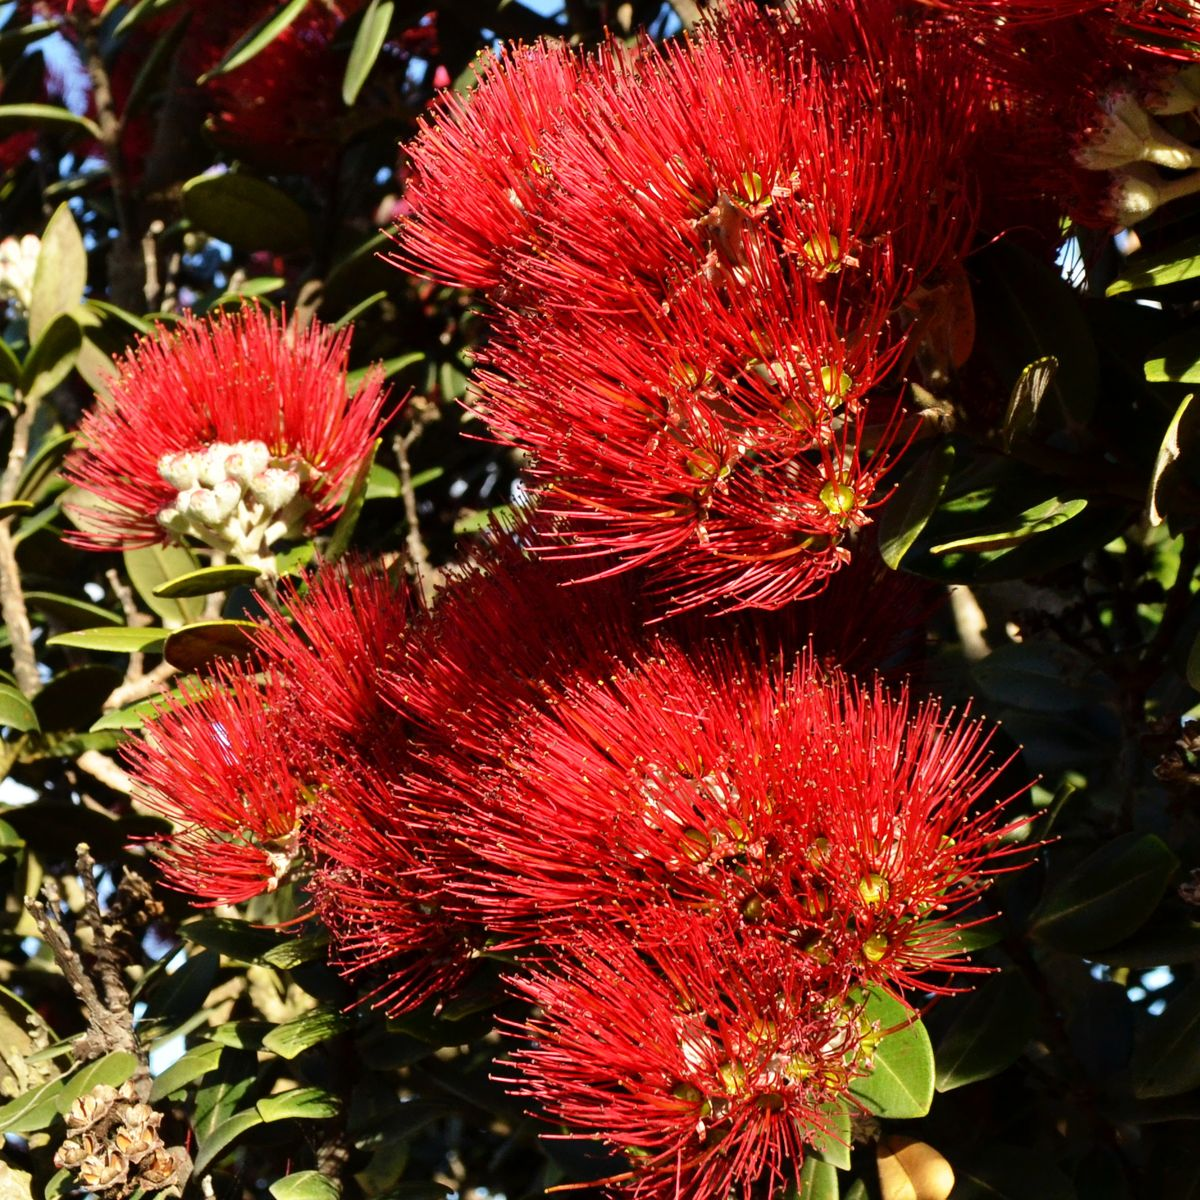 Pohutukawa - Neuselands Weihnachtsbaum